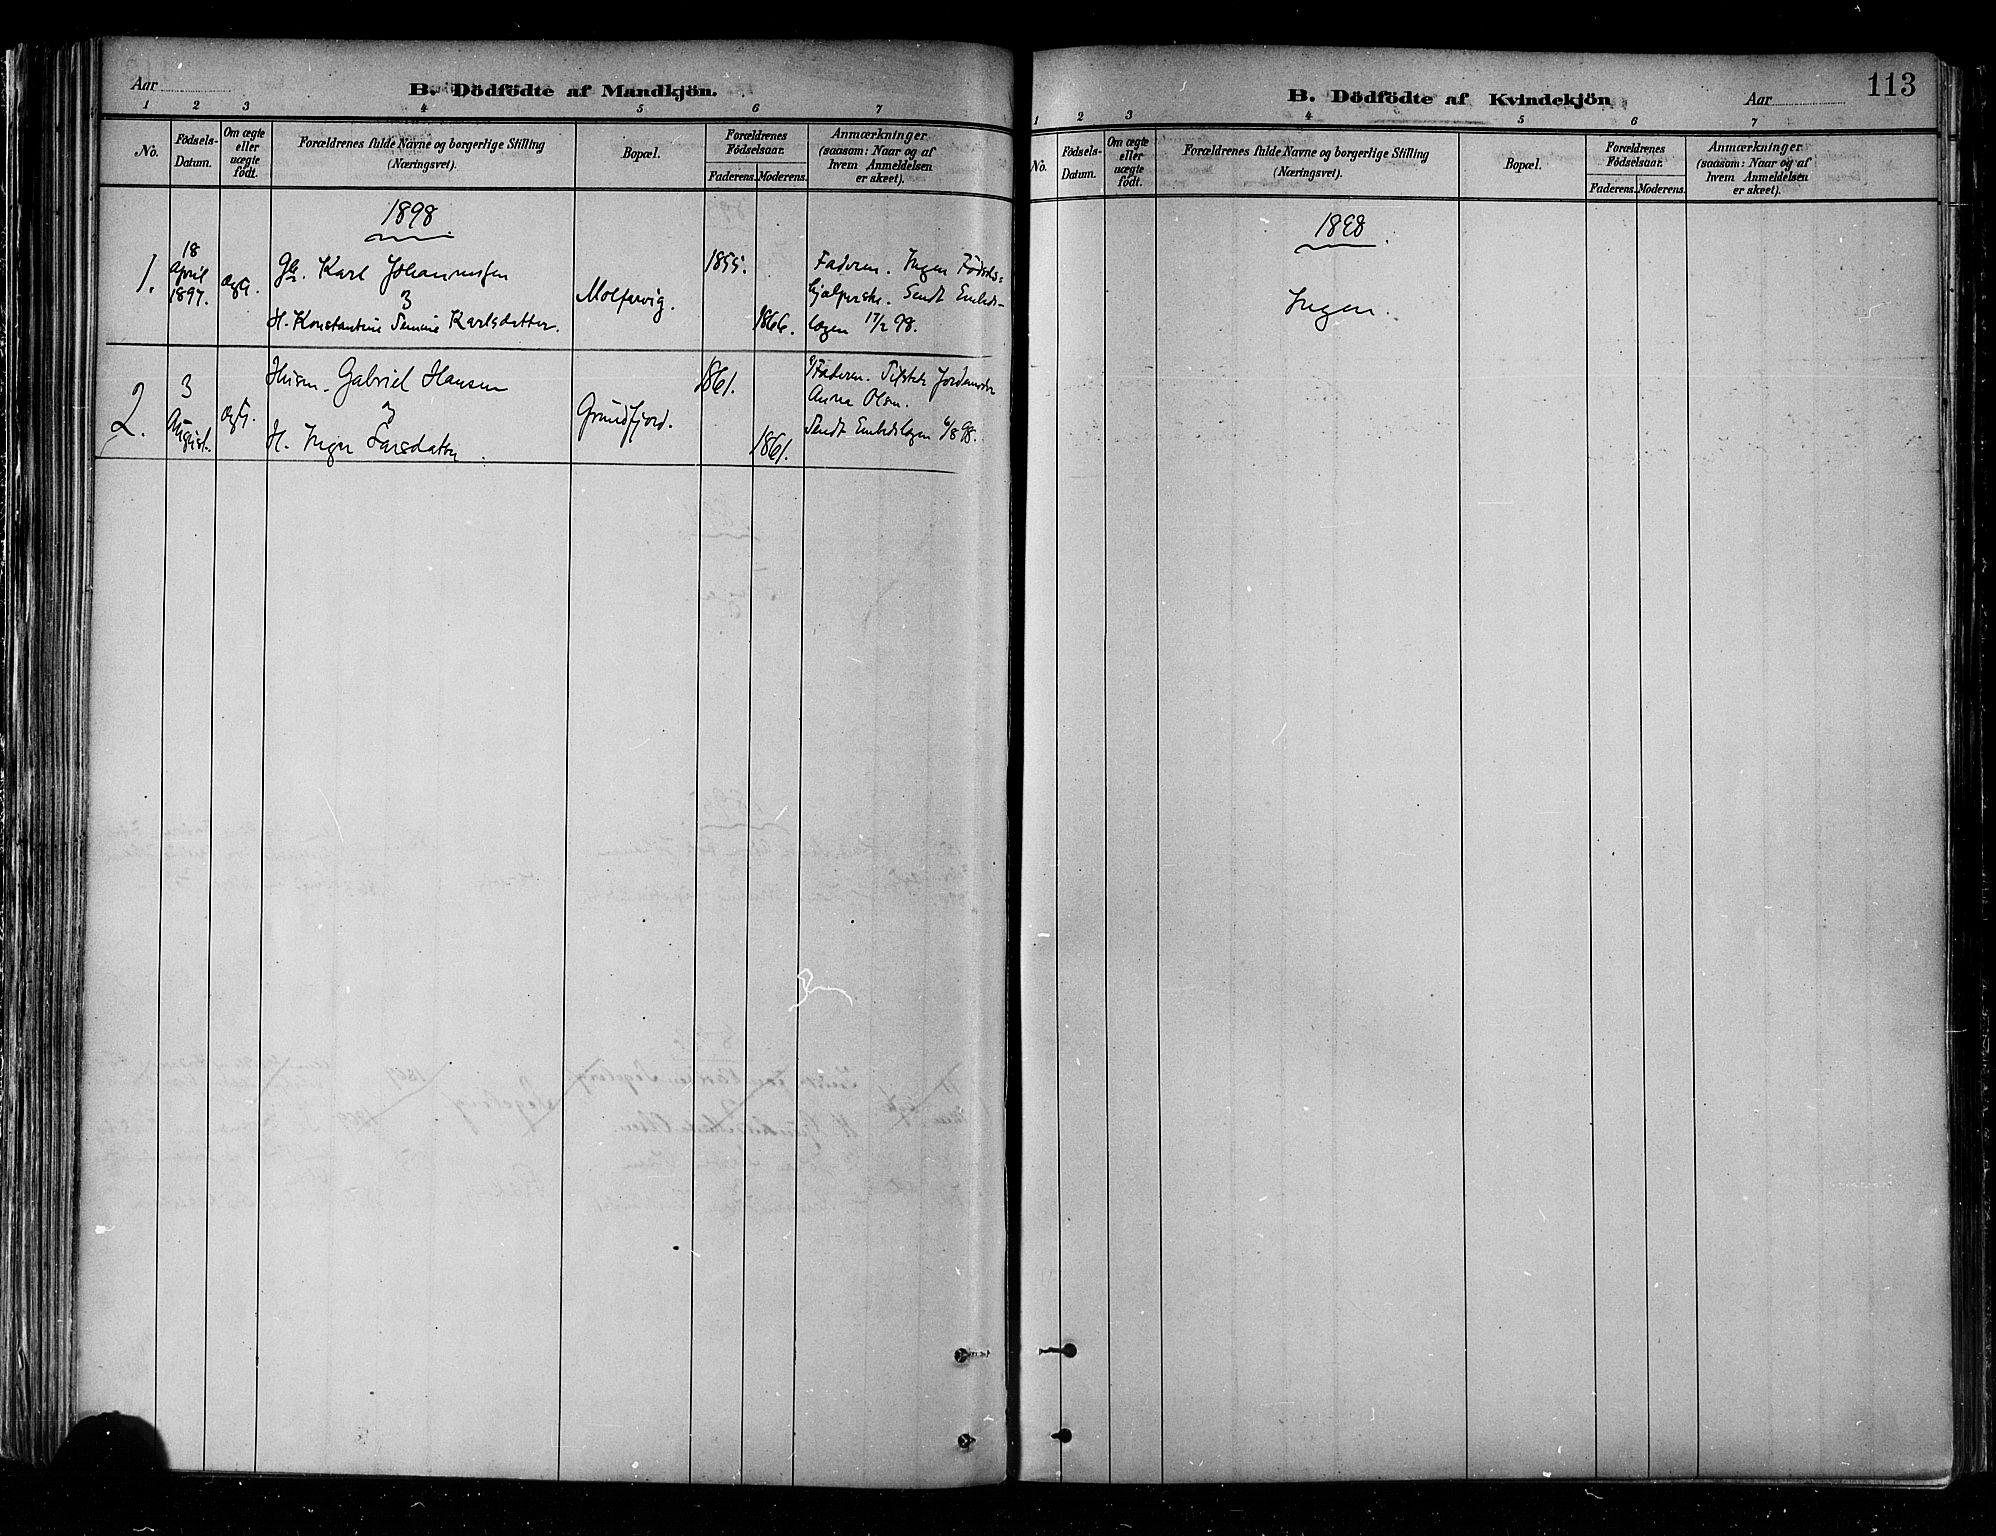 SATØ, Skjervøy sokneprestkontor, H/Ha/Haa/L0010kirke: Ministerialbok nr. 10, 1887-1898, s. 113